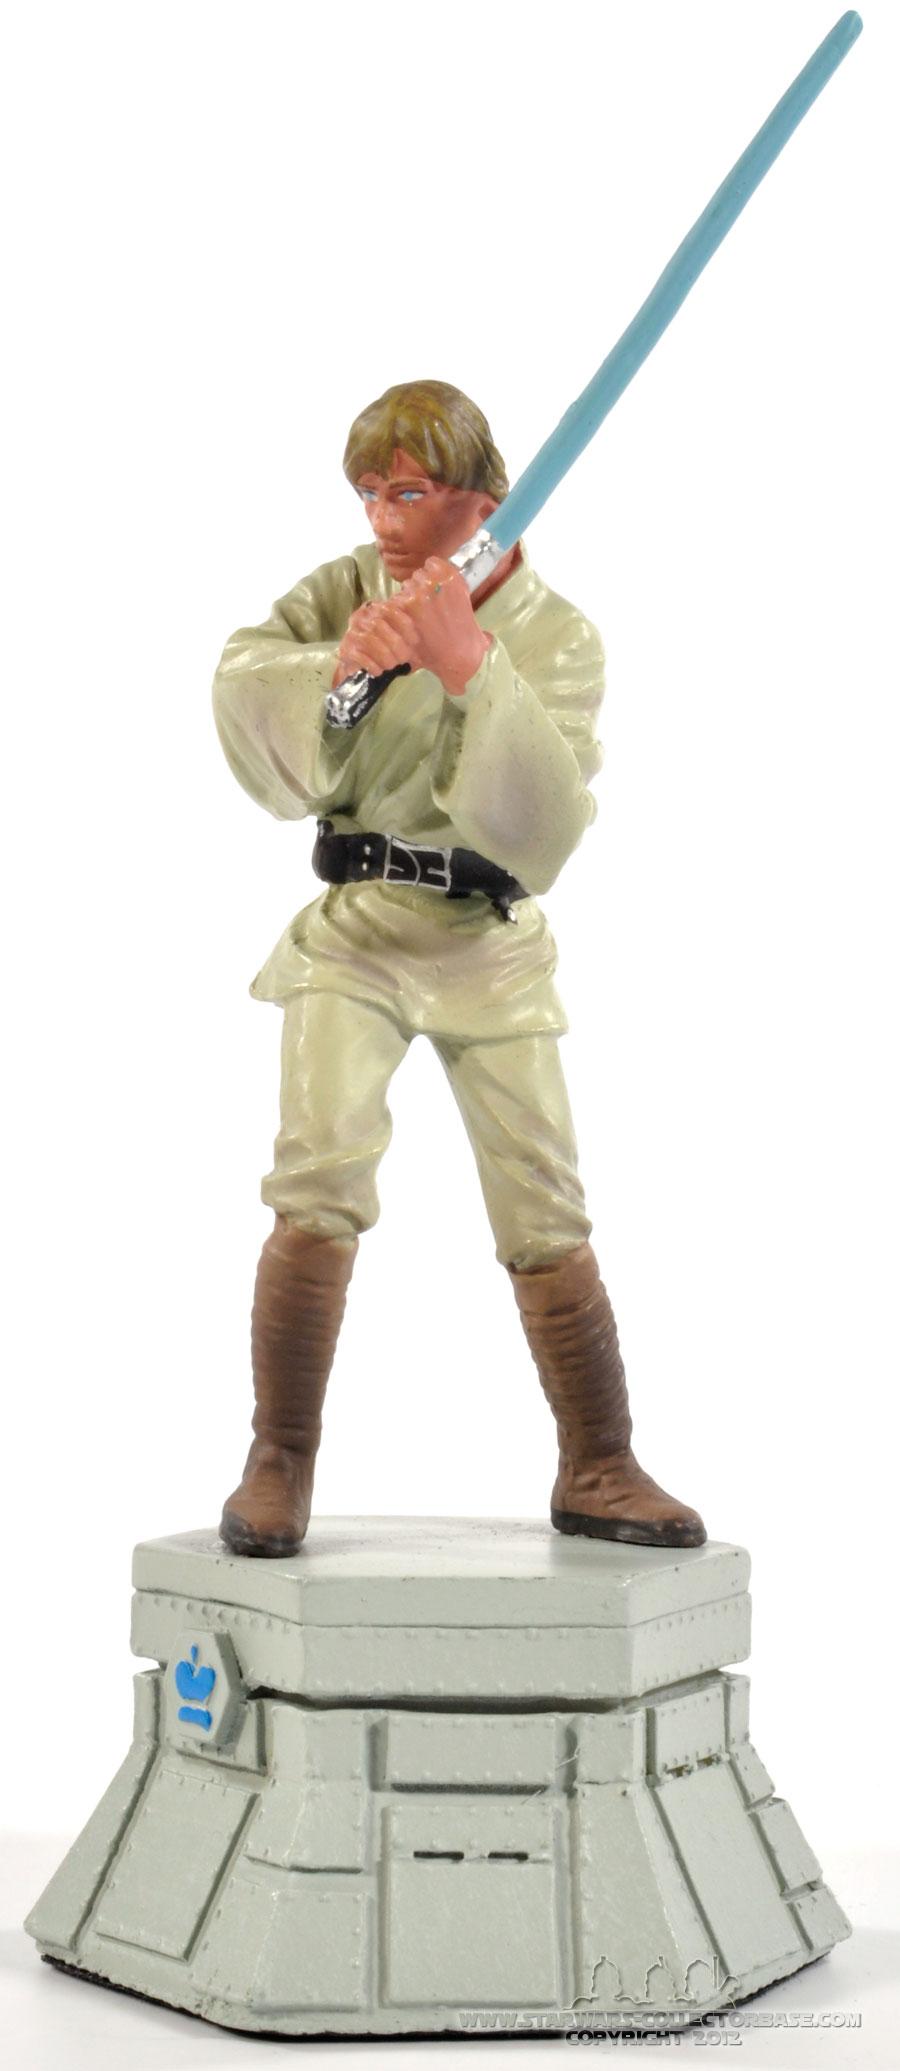 Luke Skywalker & R2-D2